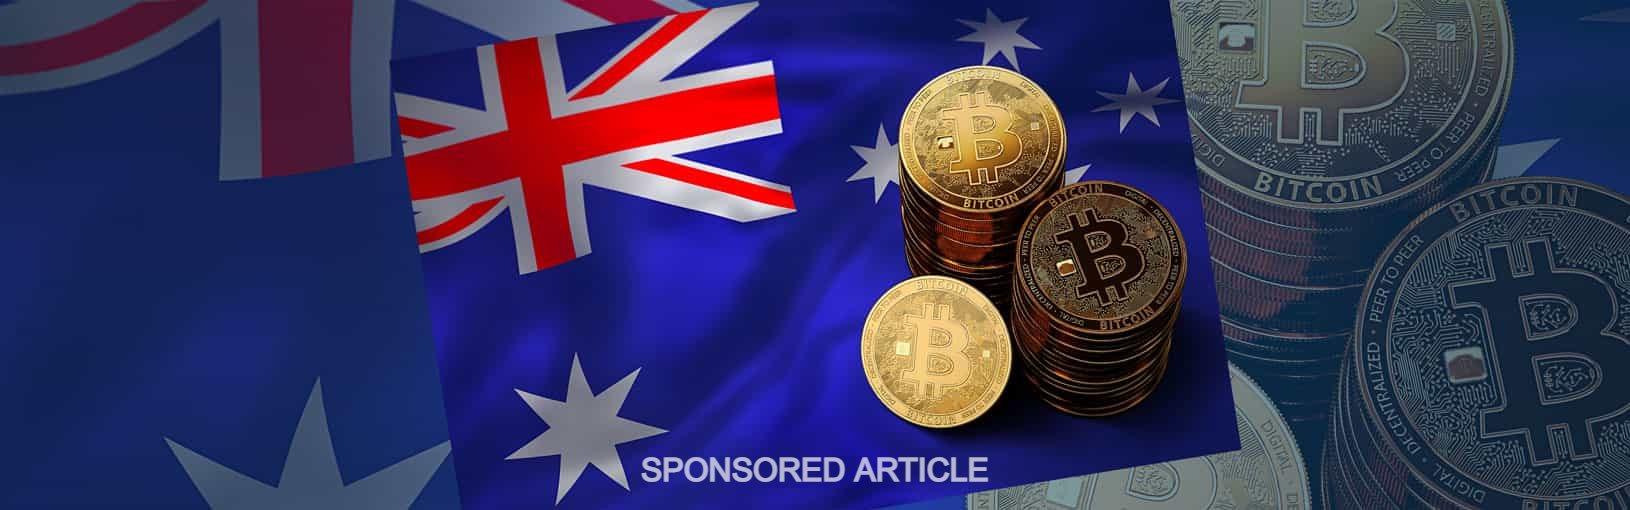 prekybininko bitcoin consso kas atsitiko su crypto market